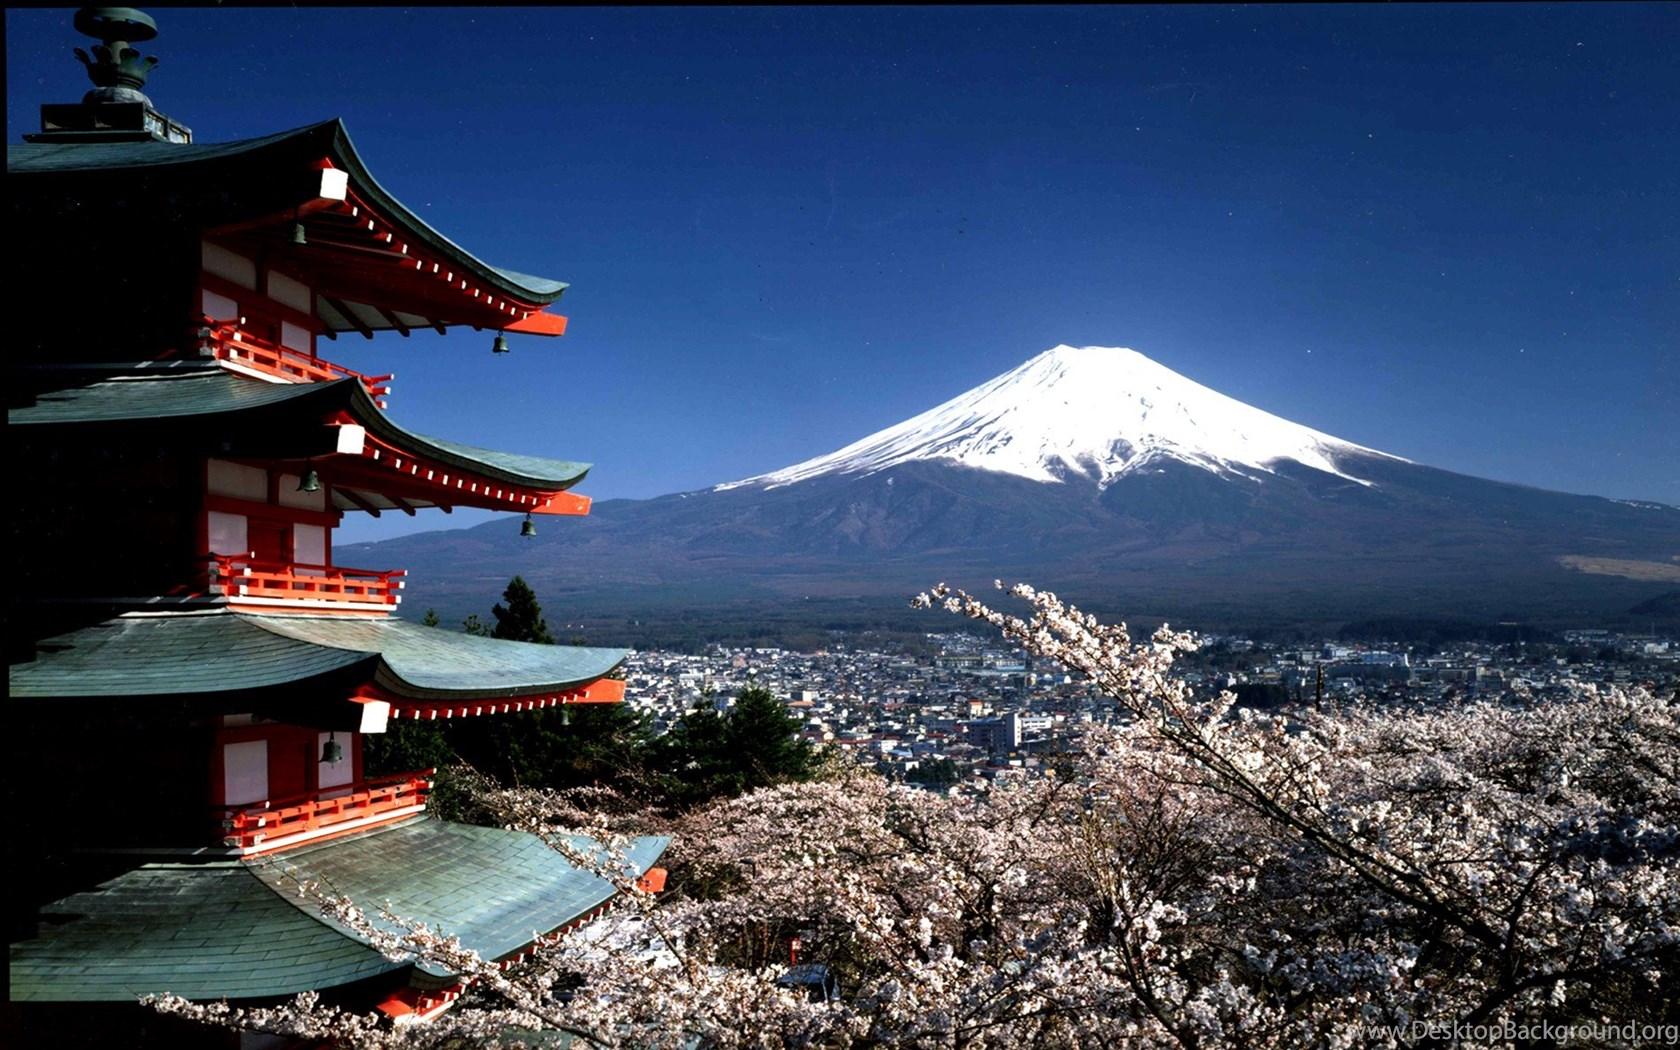 Hd Japan Wallpapers 1080p: Japan Tokyo Japan Wallpapers Widescreen 1080p